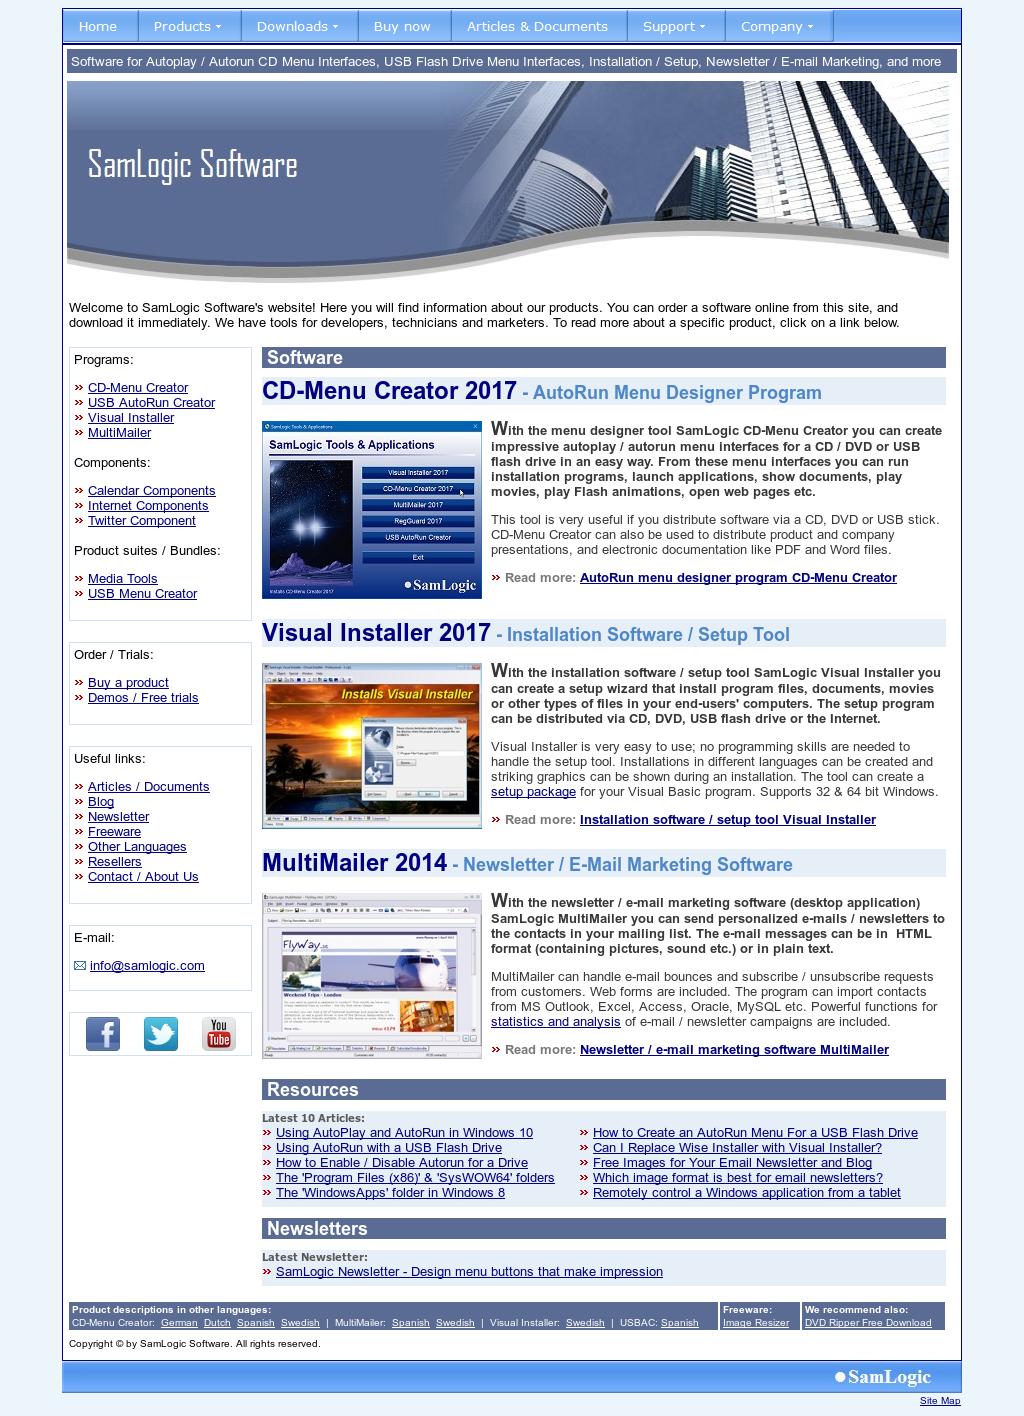 Owler Reports - Samlogic Software Blog Visual Installer: The